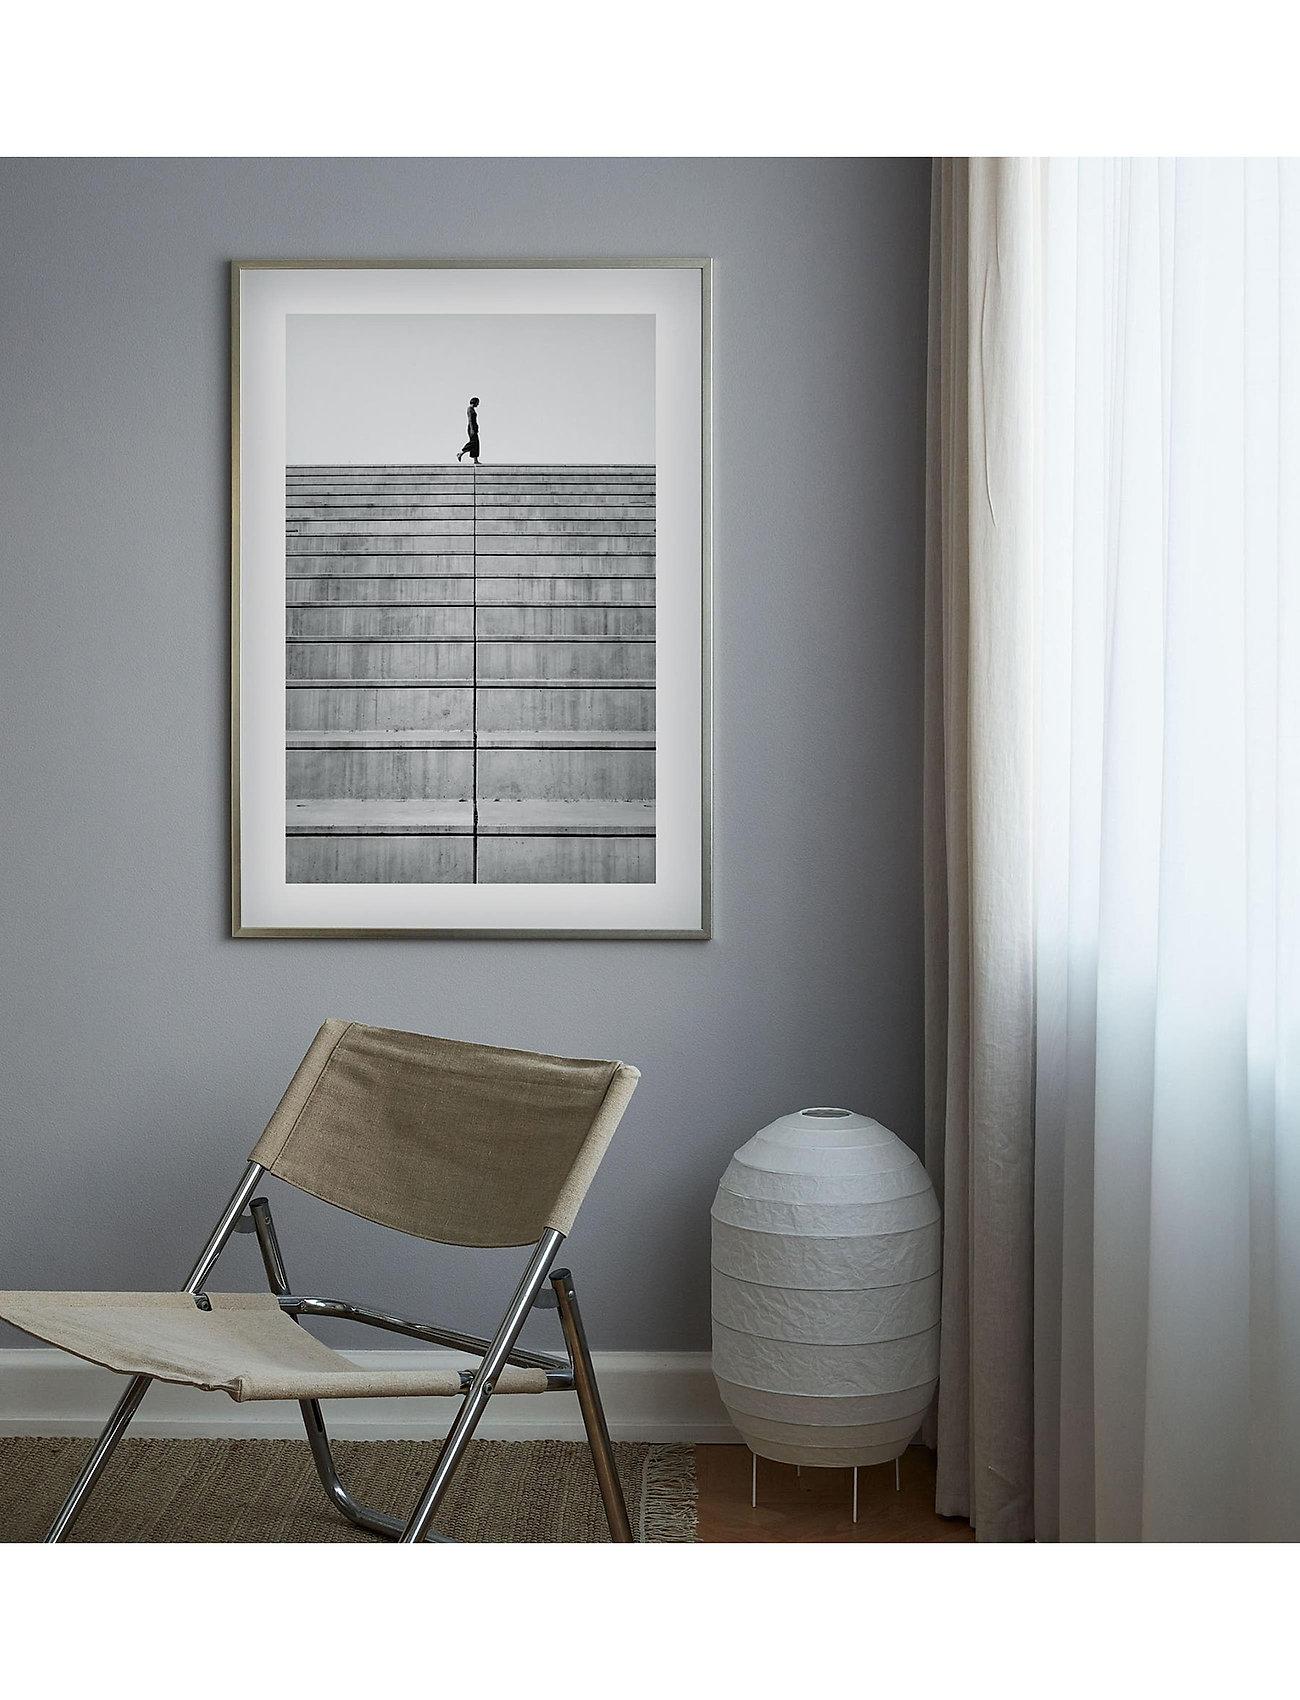 Democratic Gallery - Poster Monochrome Staircase - obrazy - black - 1